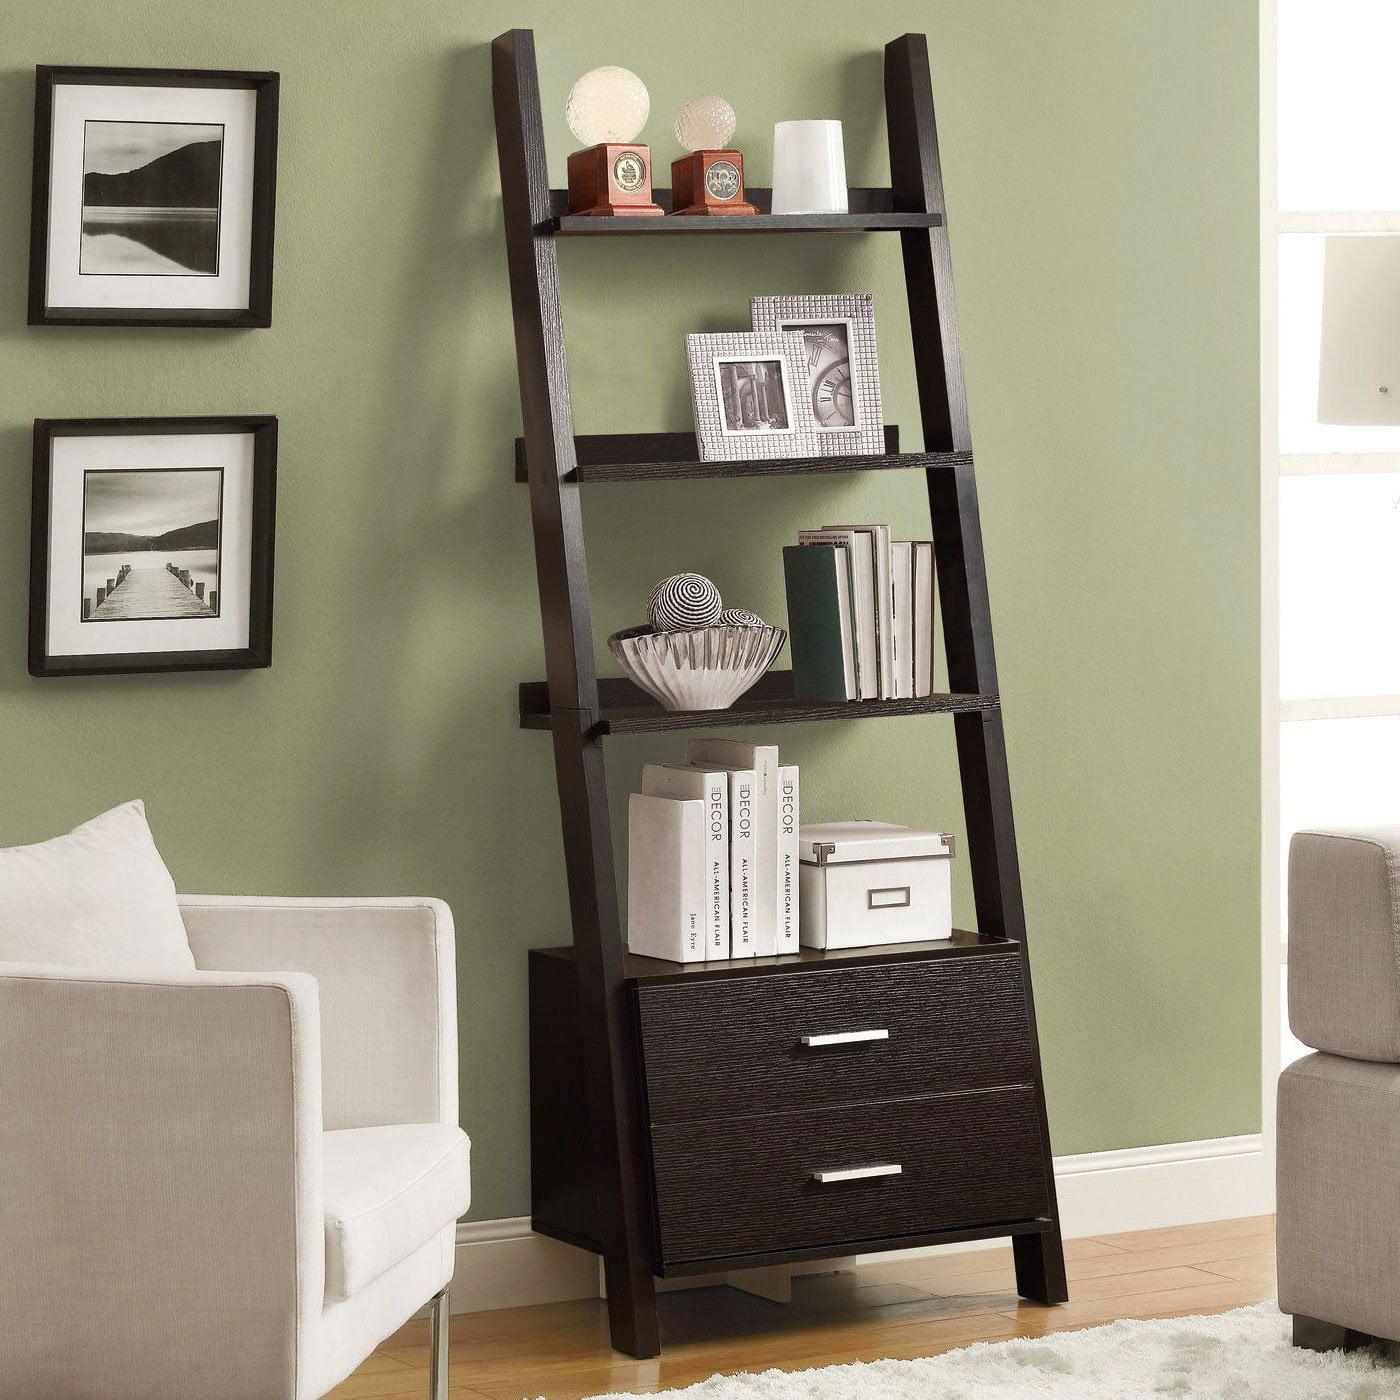 Monarch 4 Shelf Ladder Bookcase W 2 Storage Drawers Cappuccino Walmart Com Walmart Com